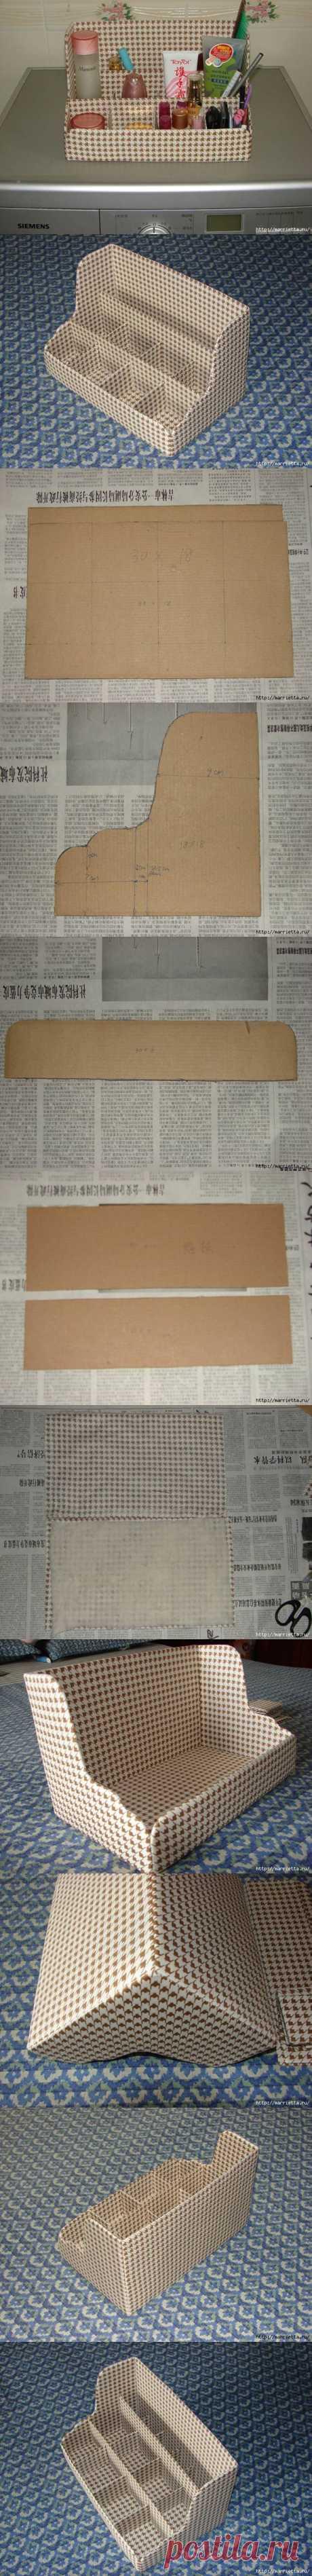 DIY Cardboard Shelves Organizer DIY Projects | UsefulDIY.com